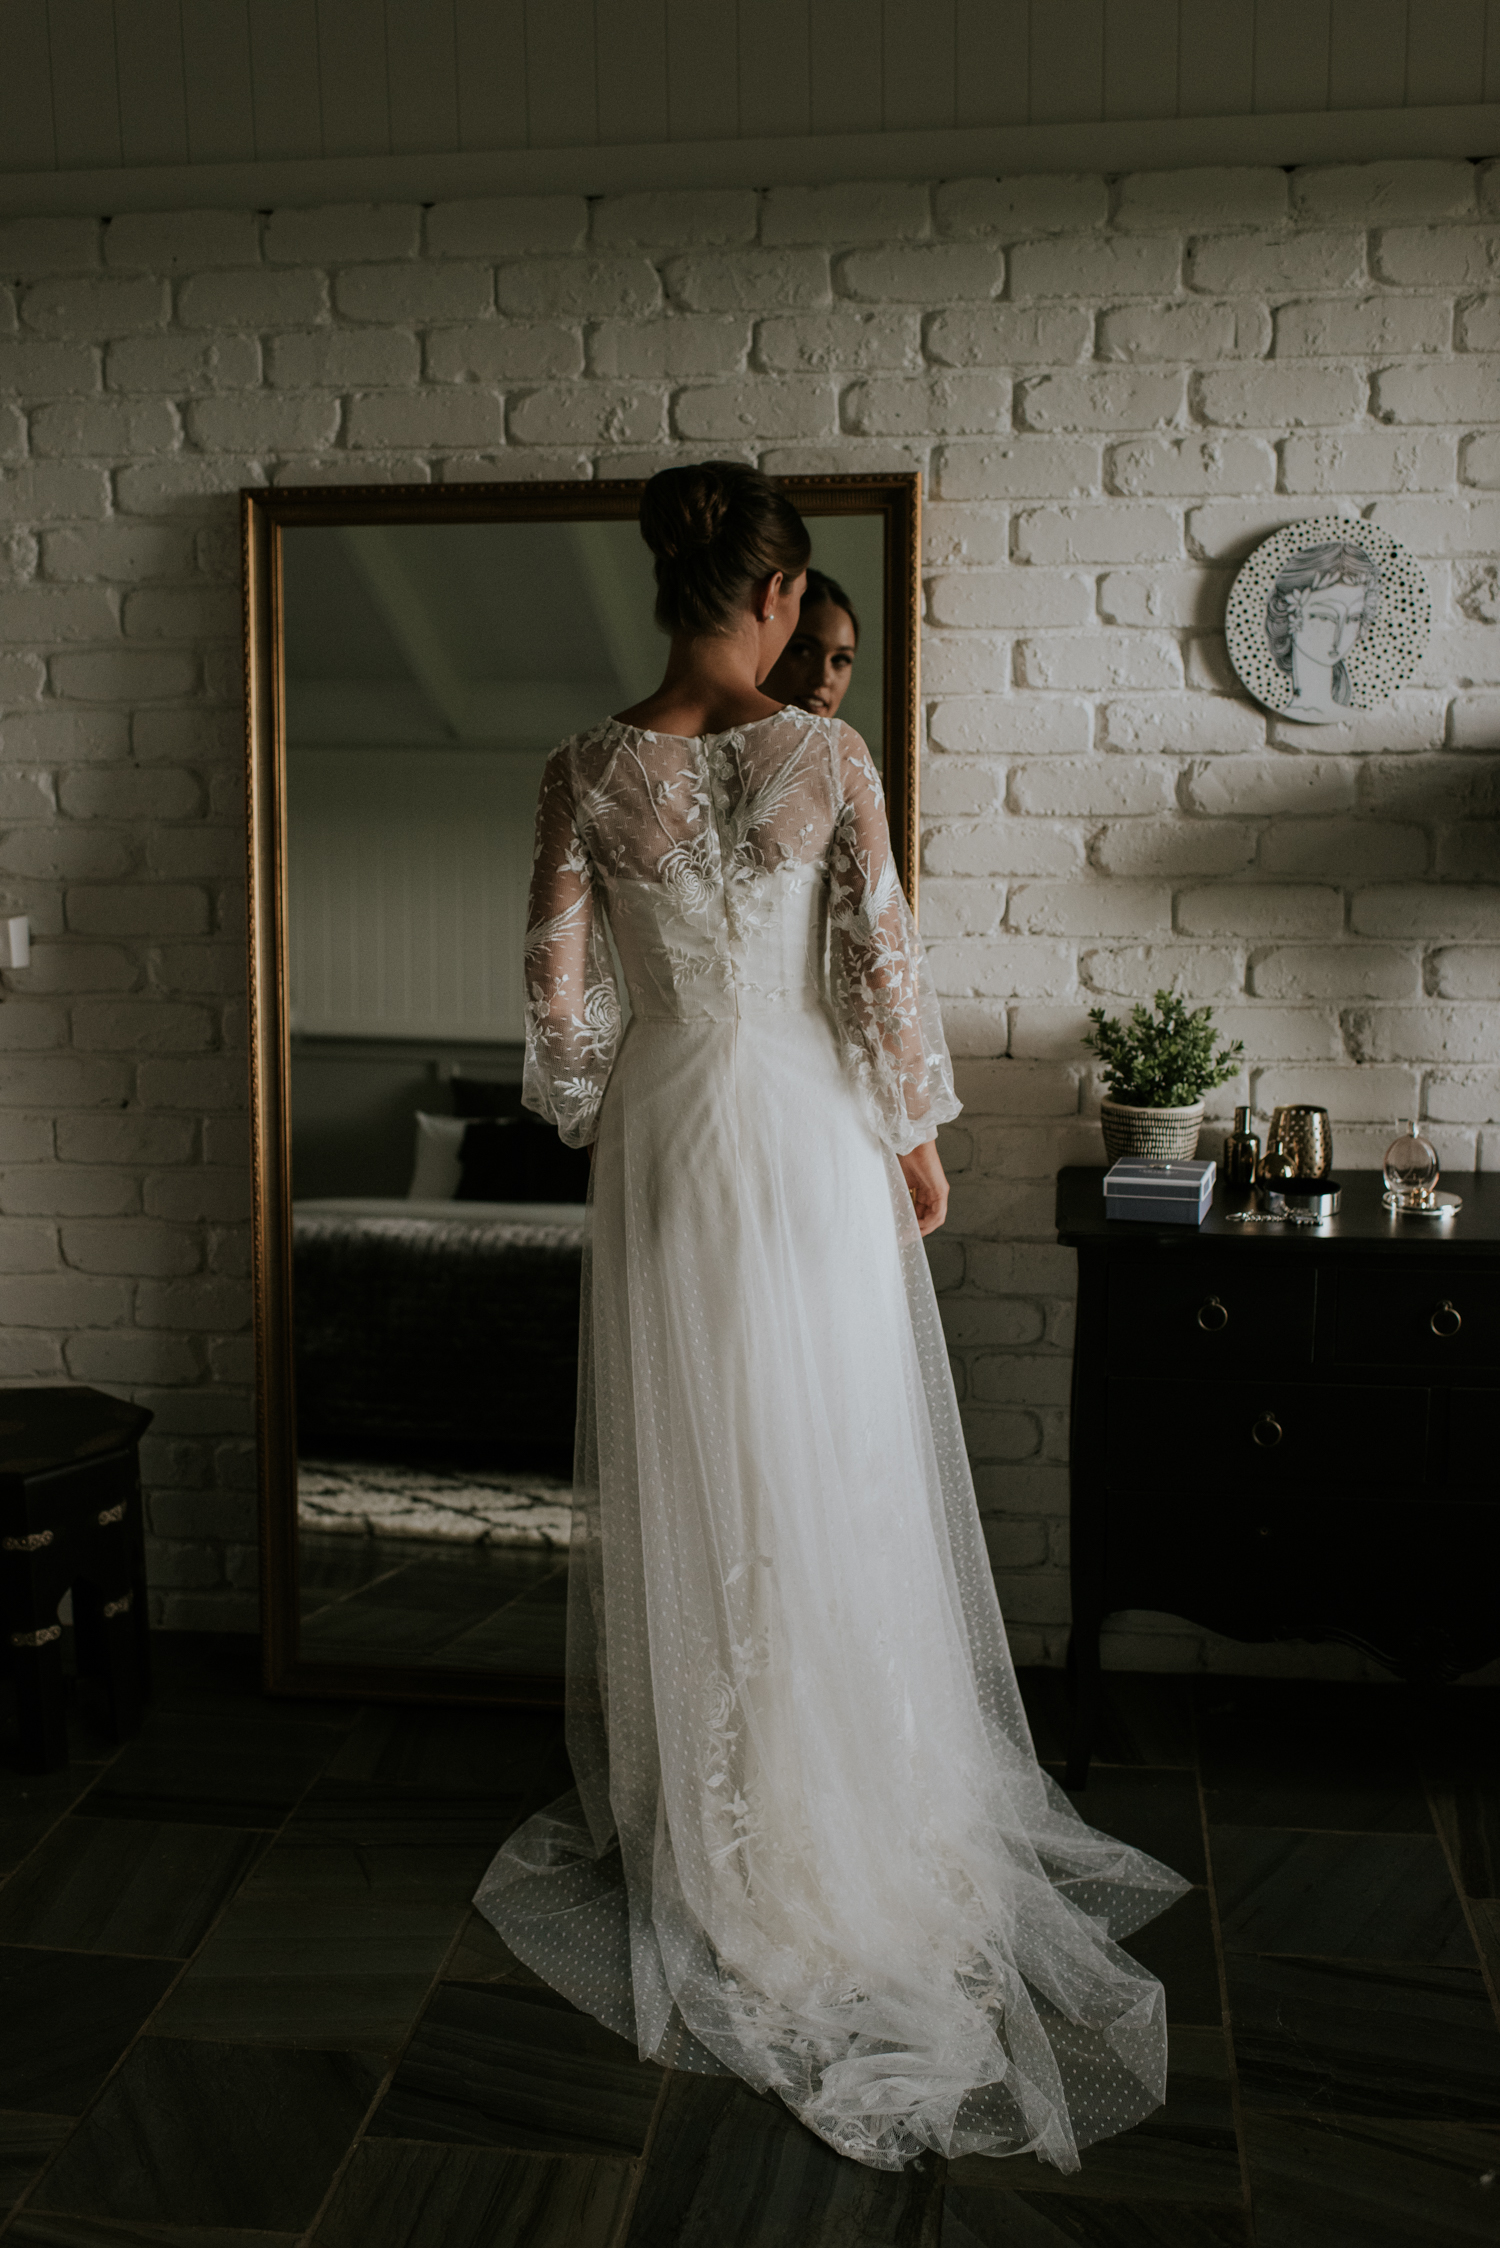 Brisbane Wedding Photographer   Engagement-Elopement Photography-36.jpg